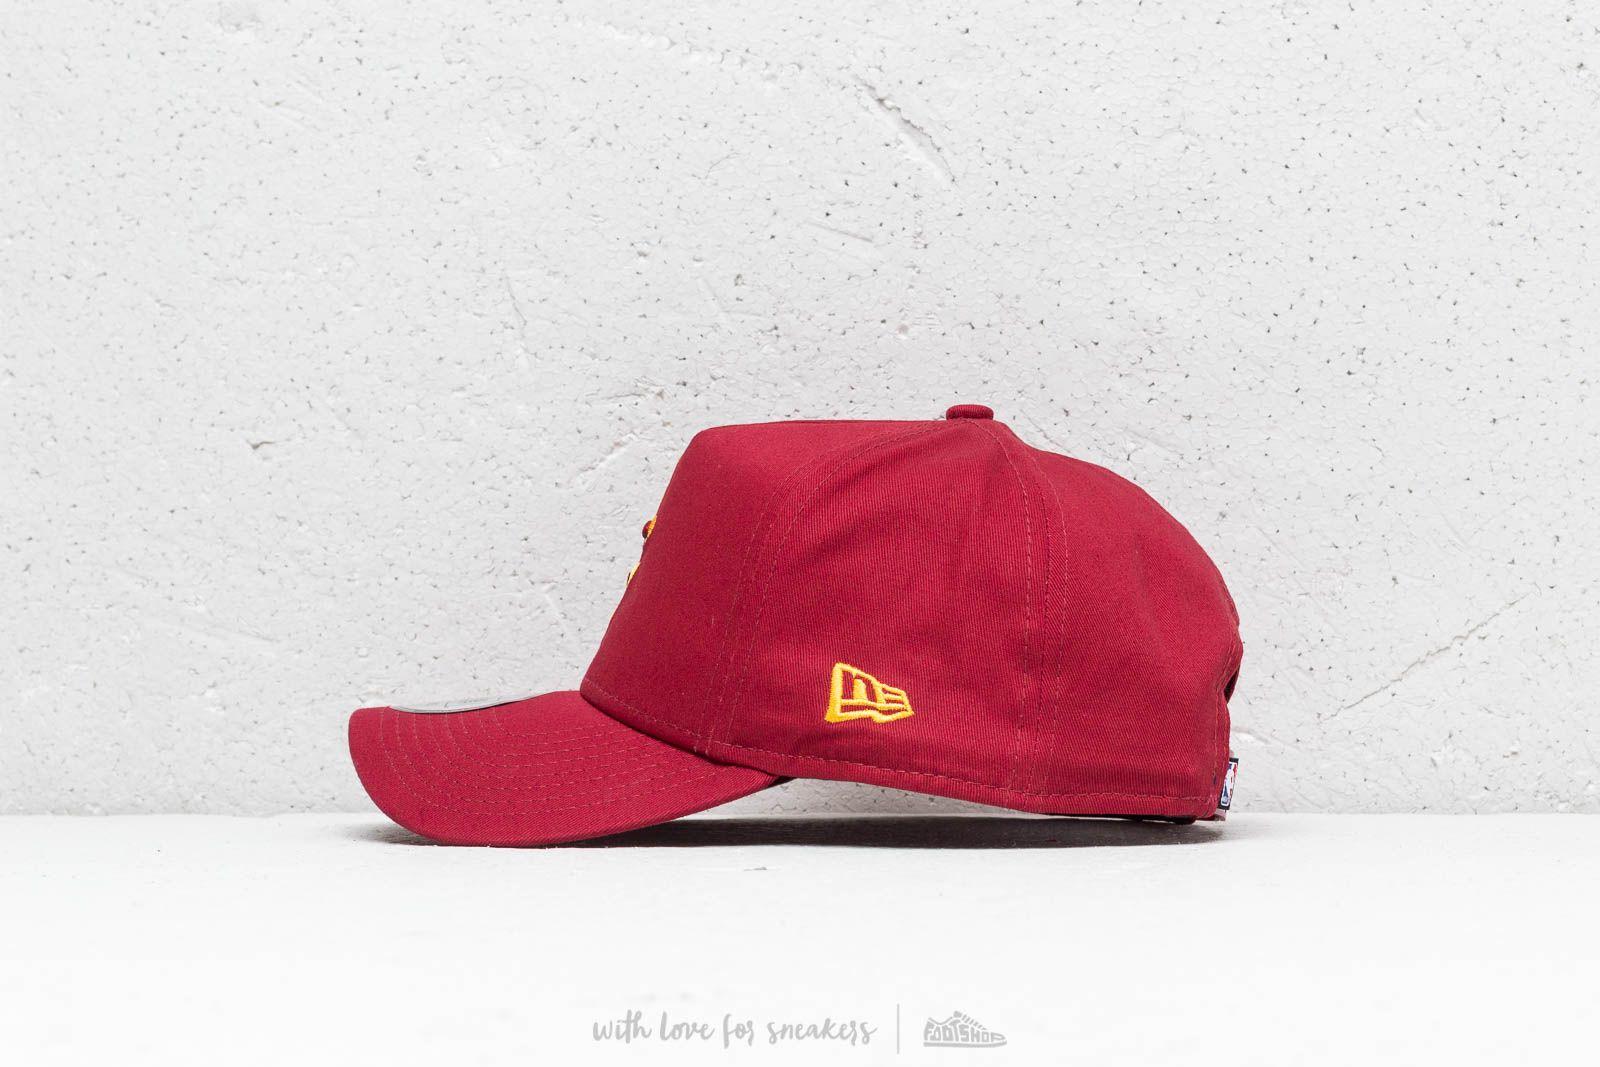 New Era NBA Cleveland Cavaliers Aframe Cap Red za skvělou cenu 690 Kč  koupíte na Footshop a0e5b8e93e